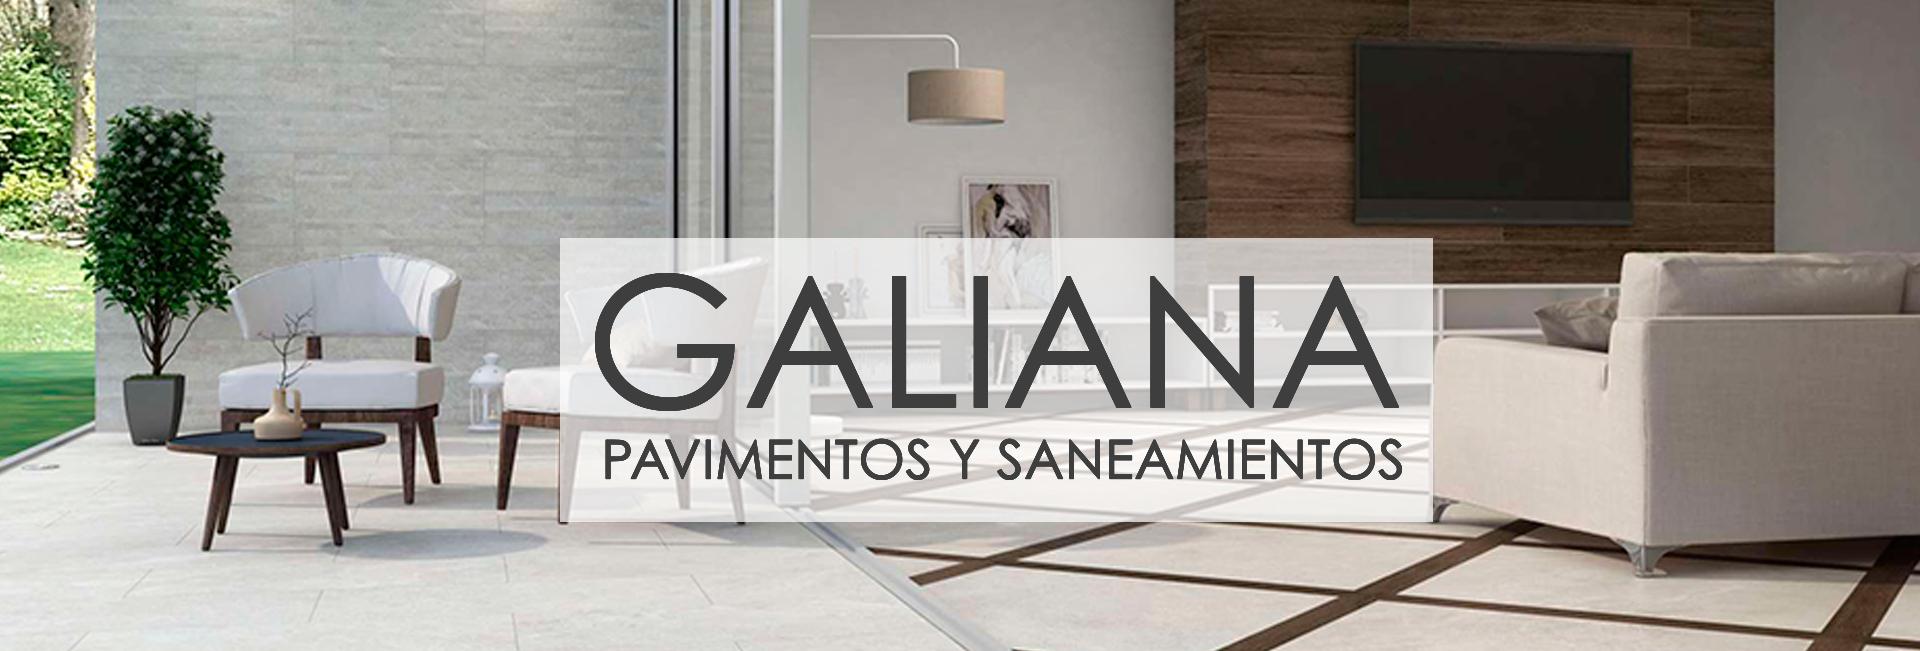 slider1_Galiana